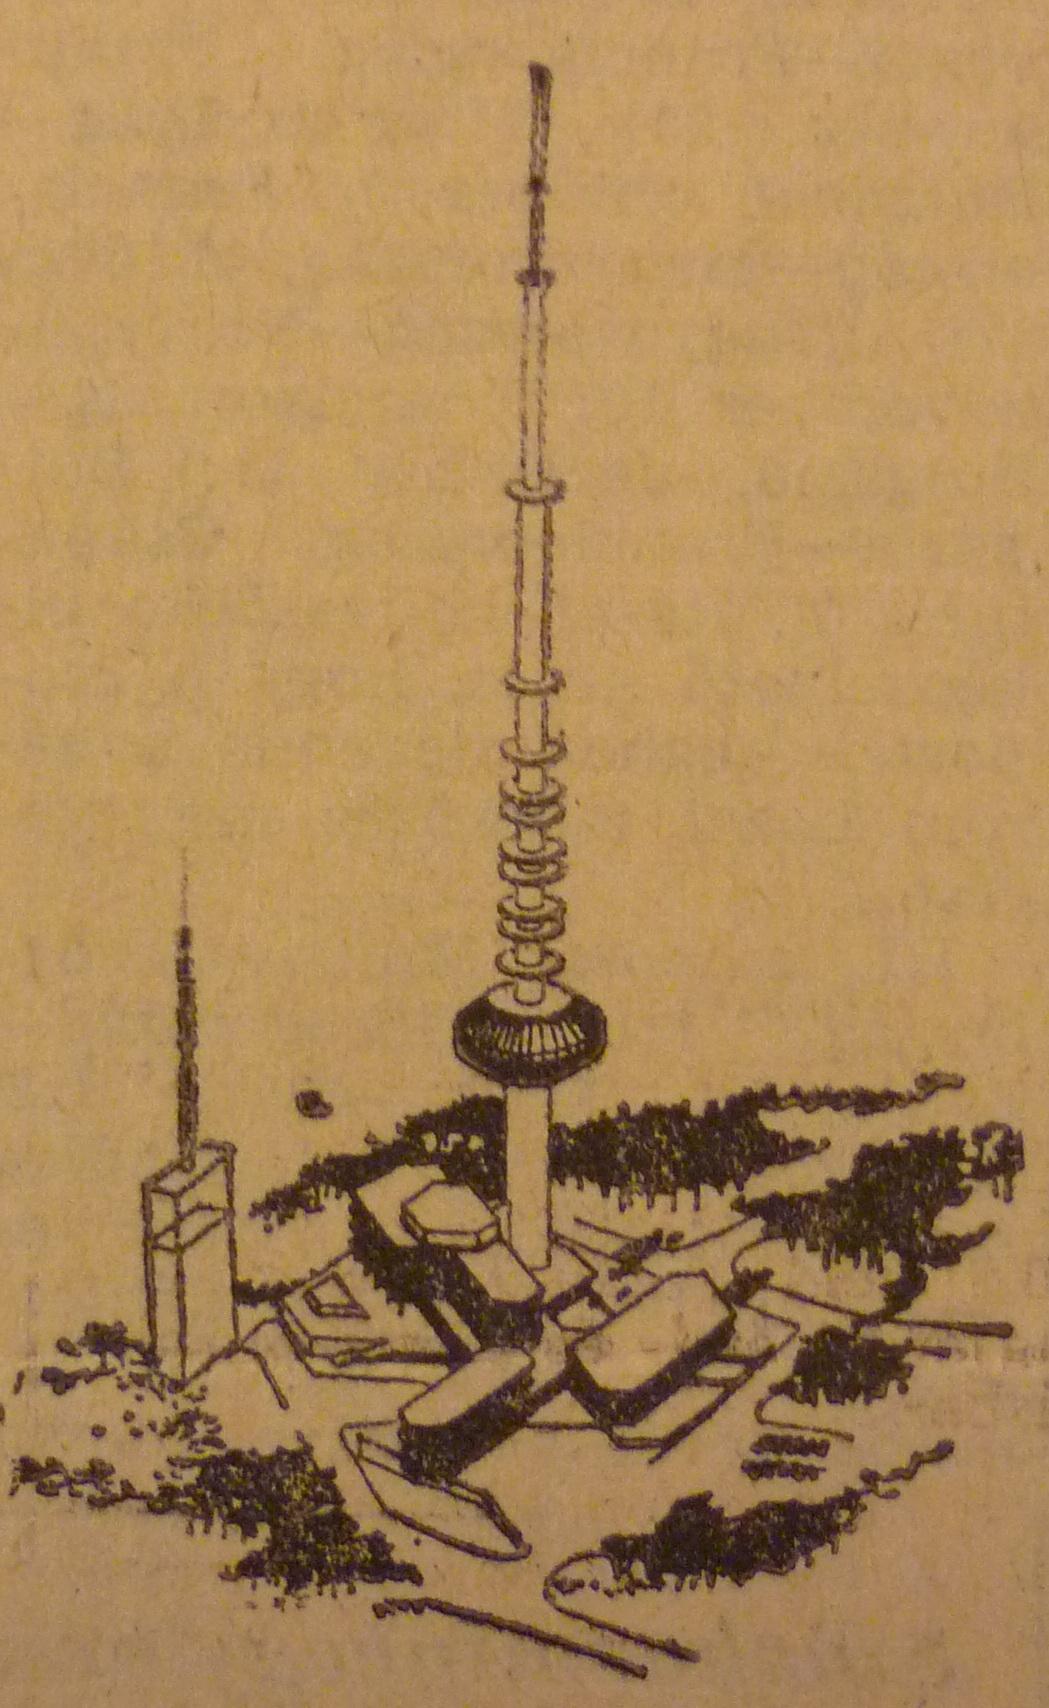 szechenyihegyiadotorony-19701230-magyarnemzet-01.jpg